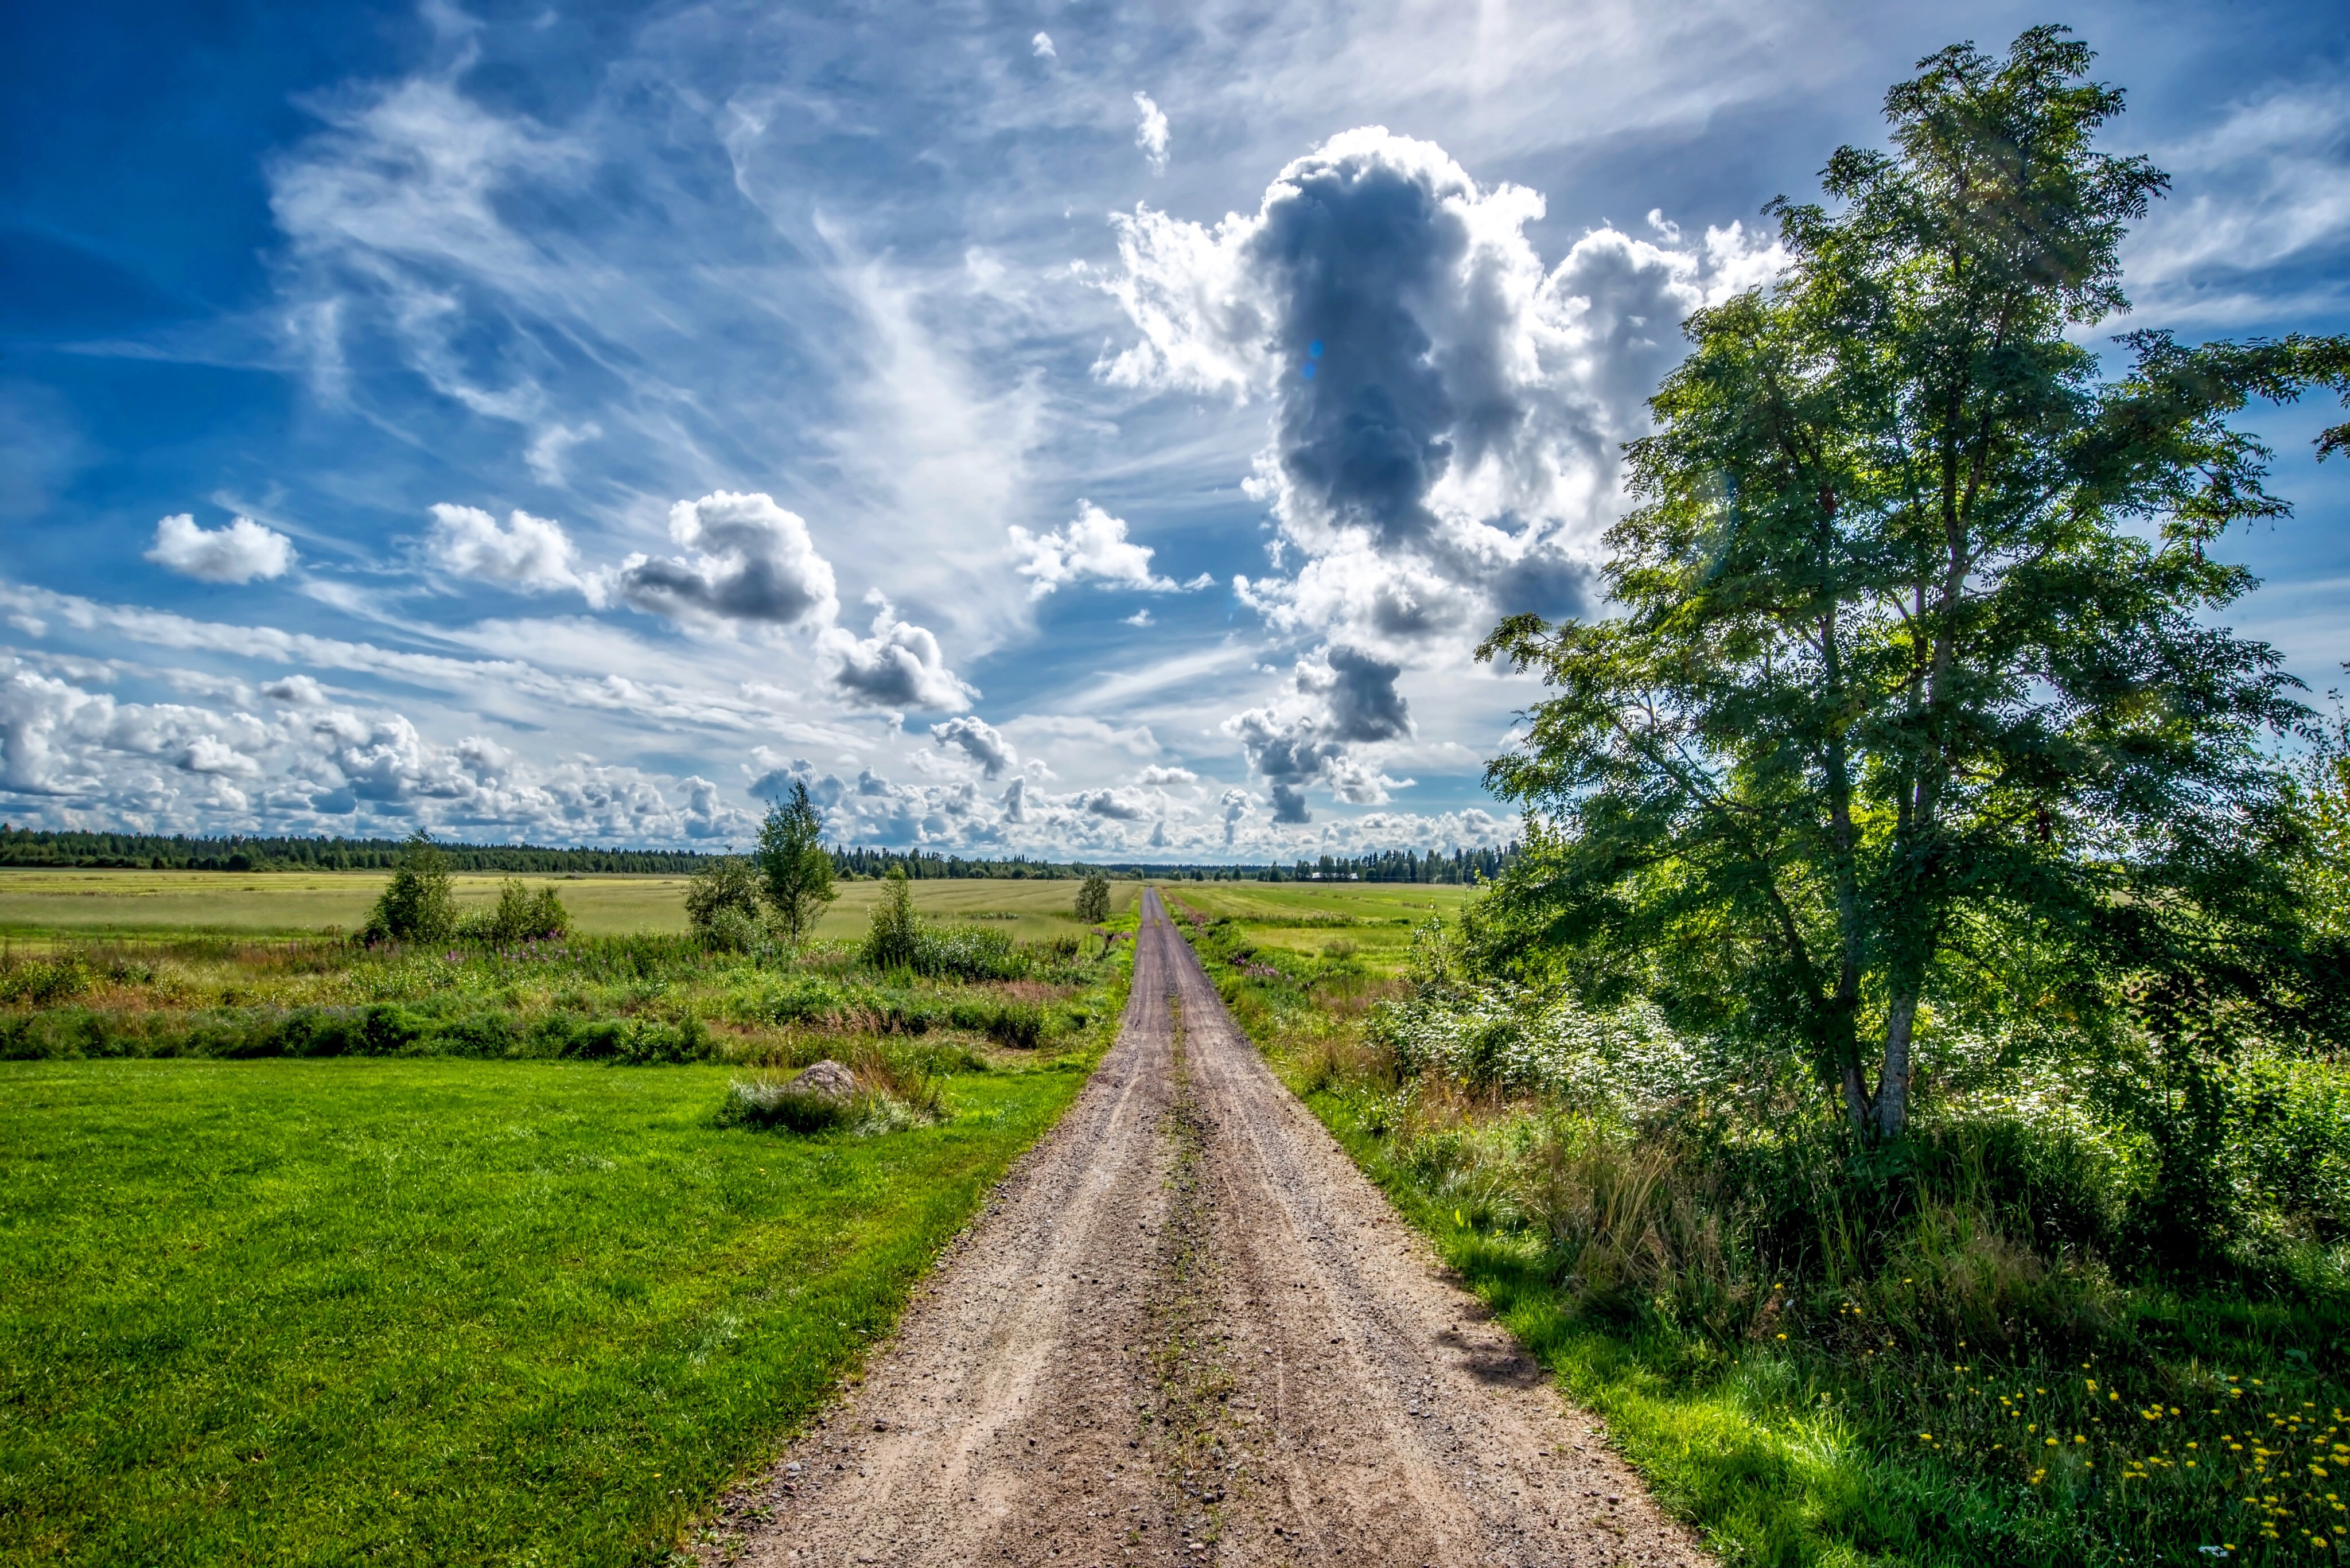 обои поле, деревья, дорога, облака картинки фото